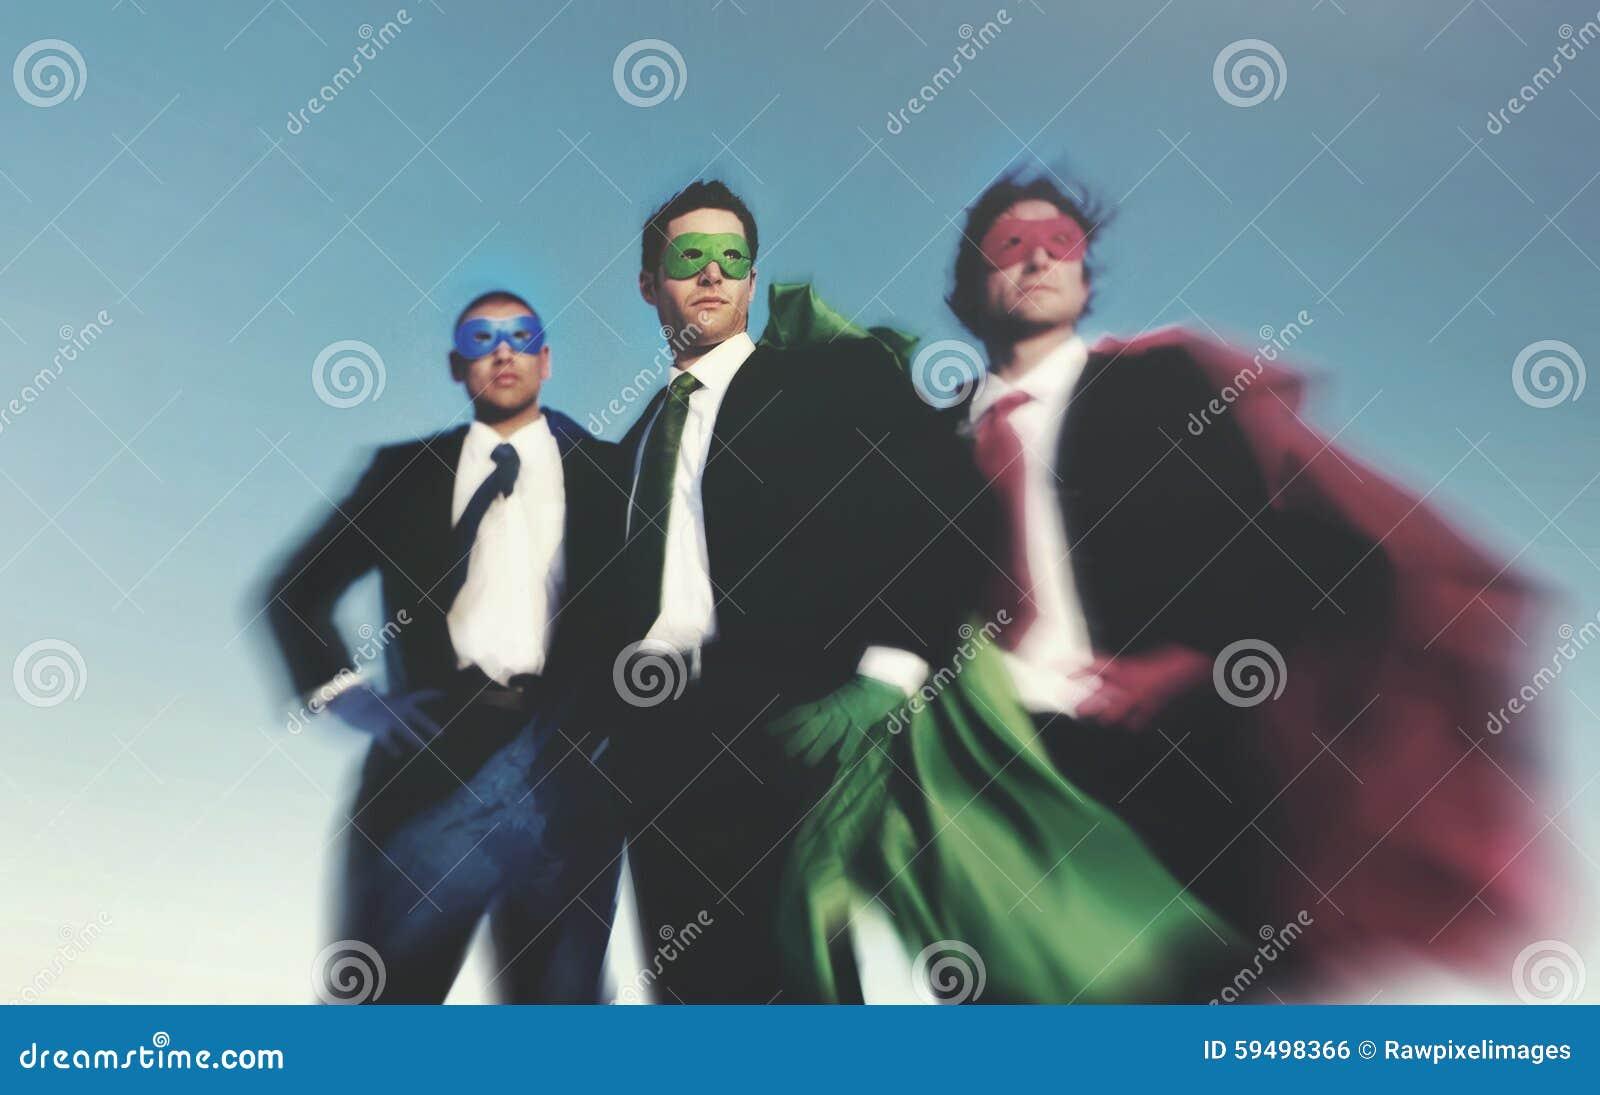 Strong Superhero Business Aspirations Confidence Success Concept